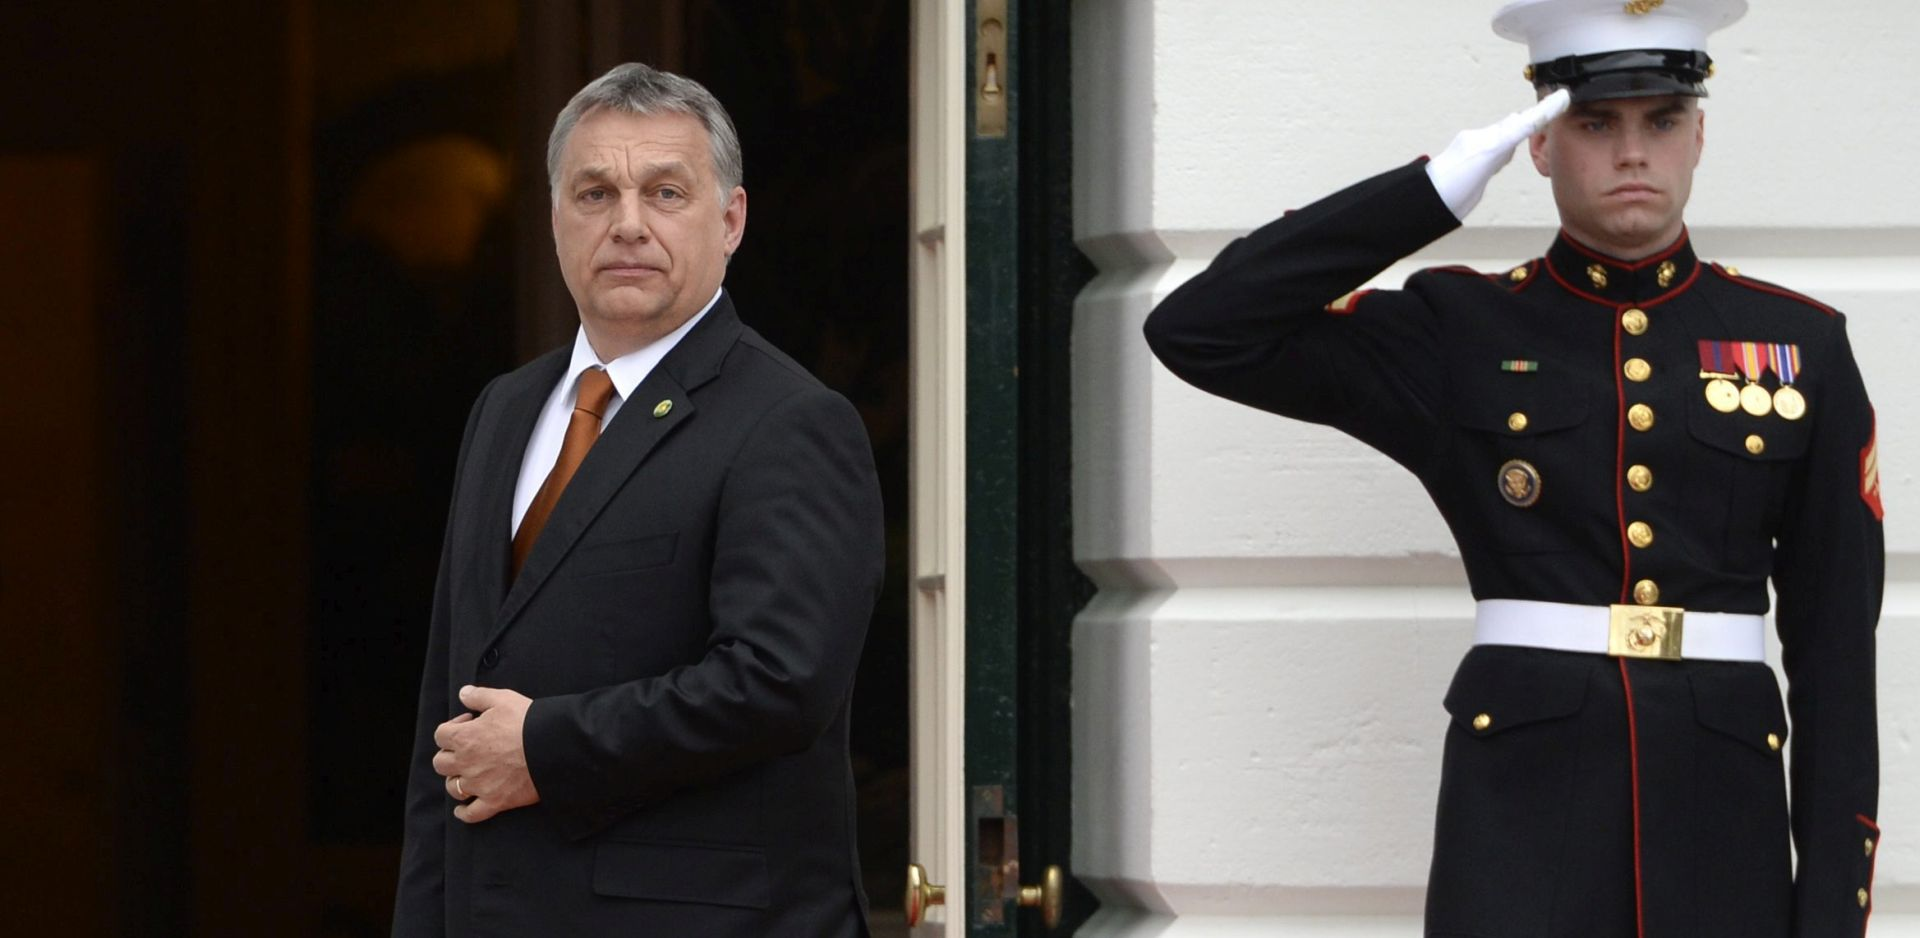 Orban u posjetu Kohlu kao pljuska Merkel